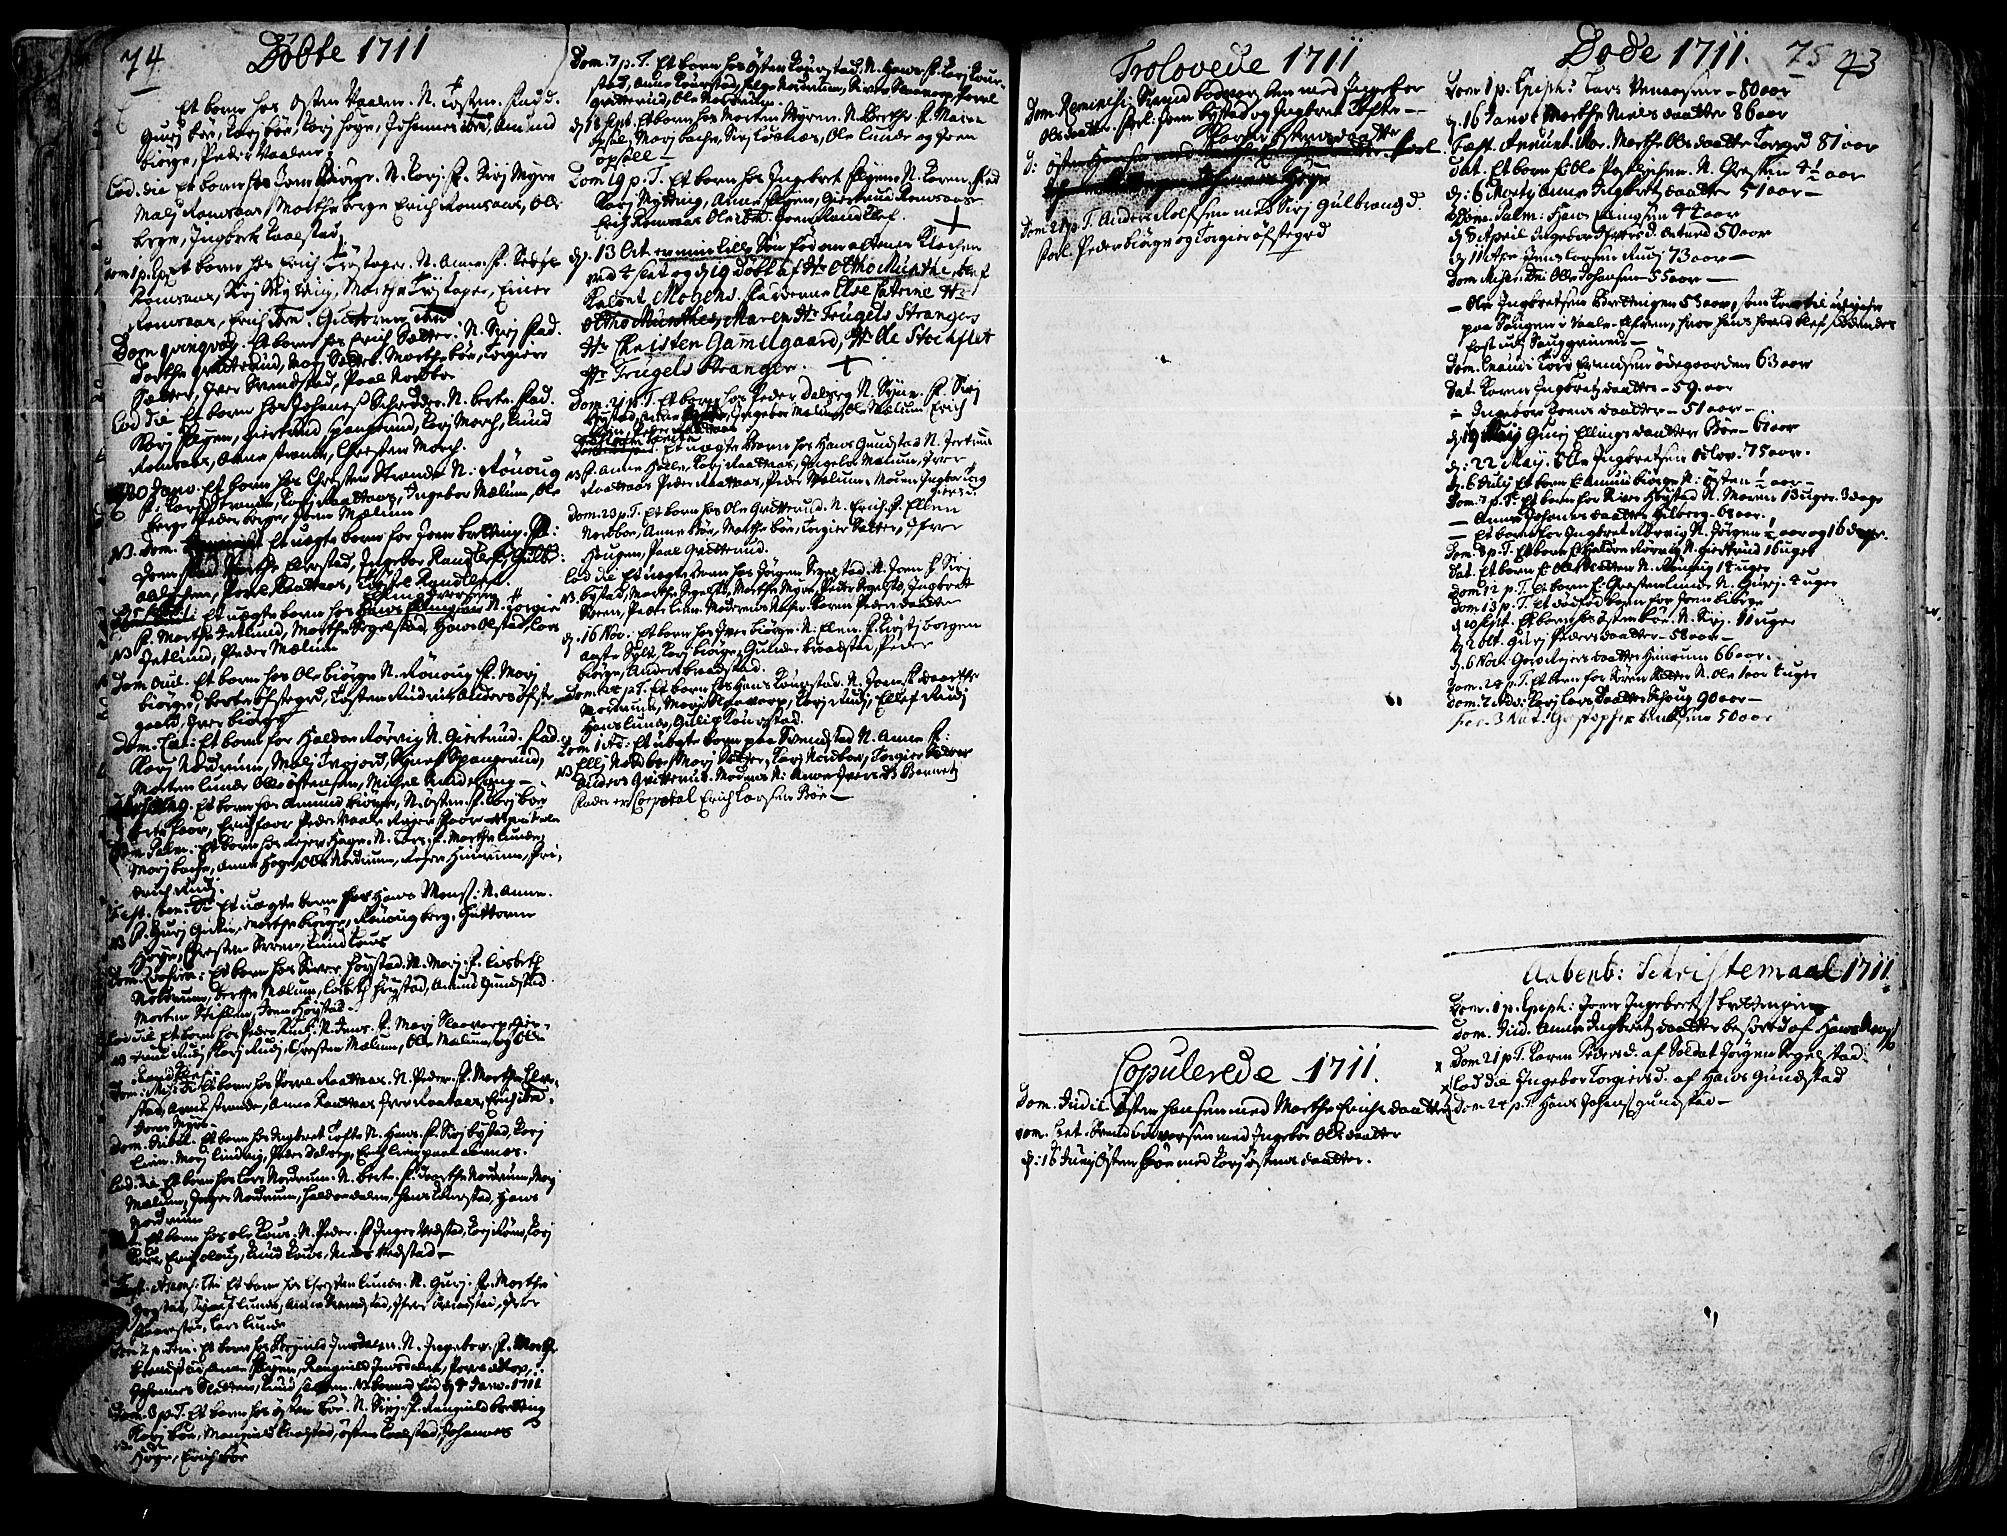 SAH, Ringebu prestekontor, Ministerialbok nr. 1, 1696-1733, s. 74-75